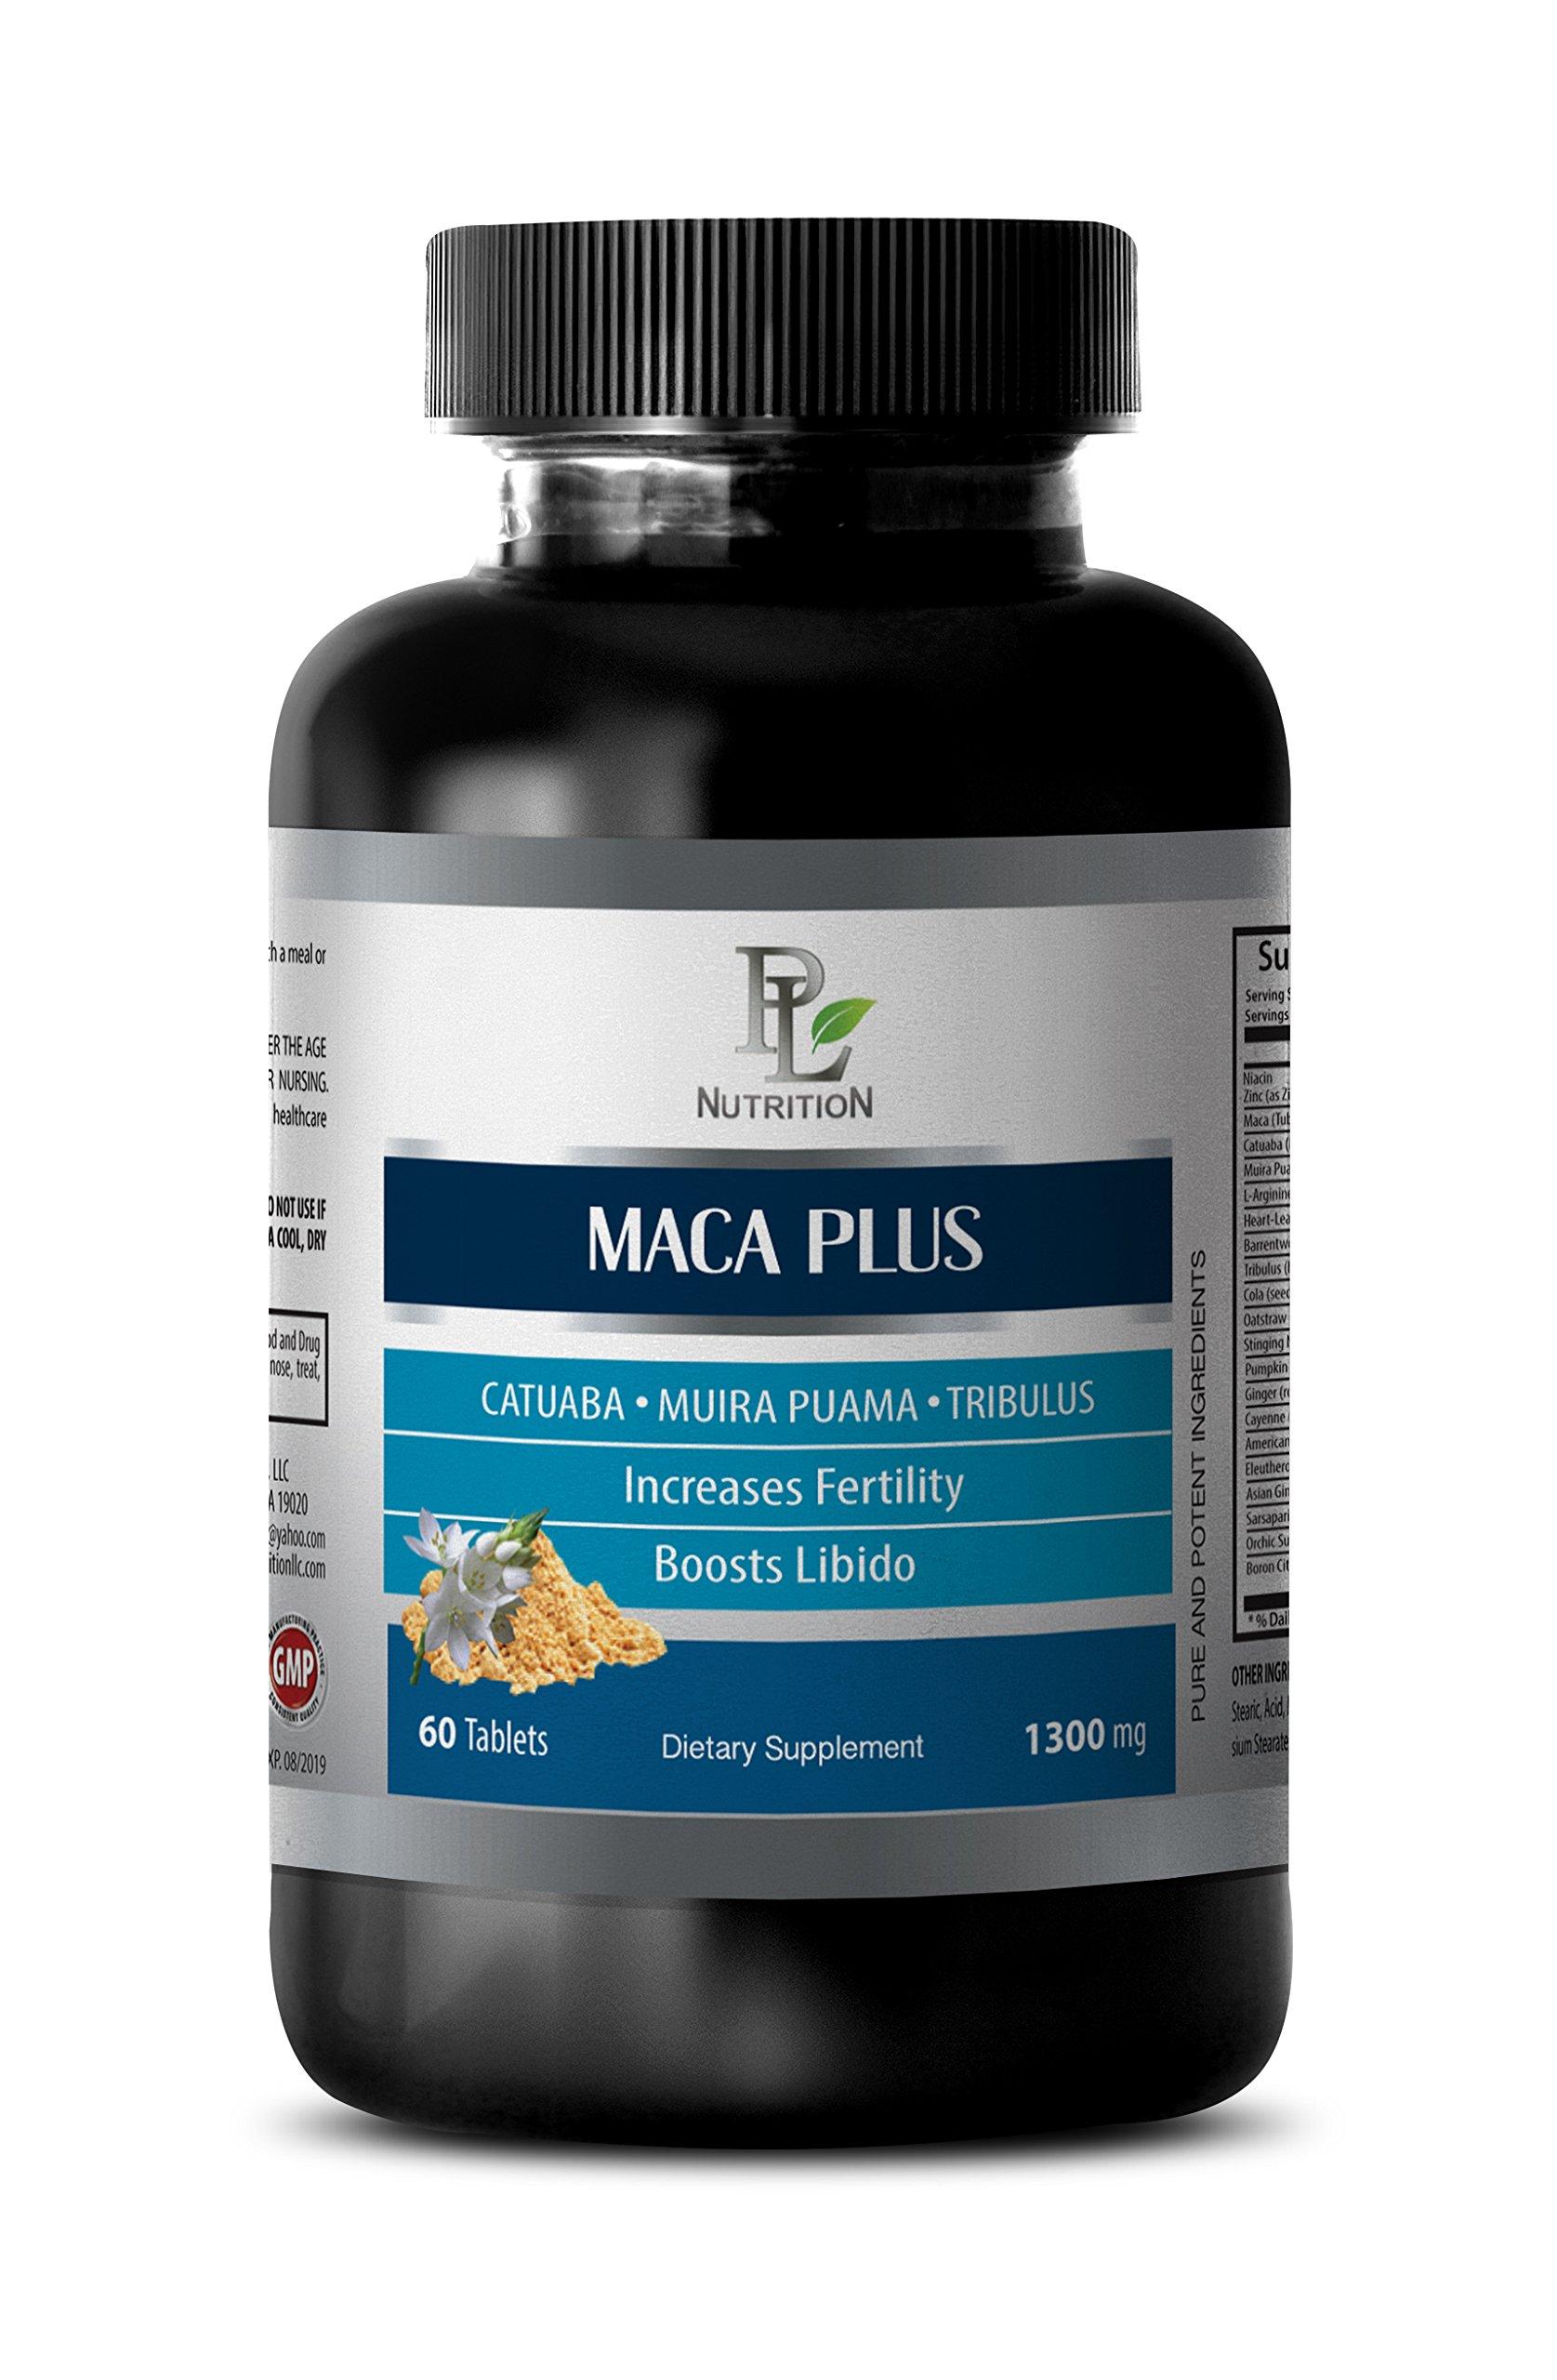 Libido boost - MACA PLUS - Maca powder - 1 Bottle 60 Tablets